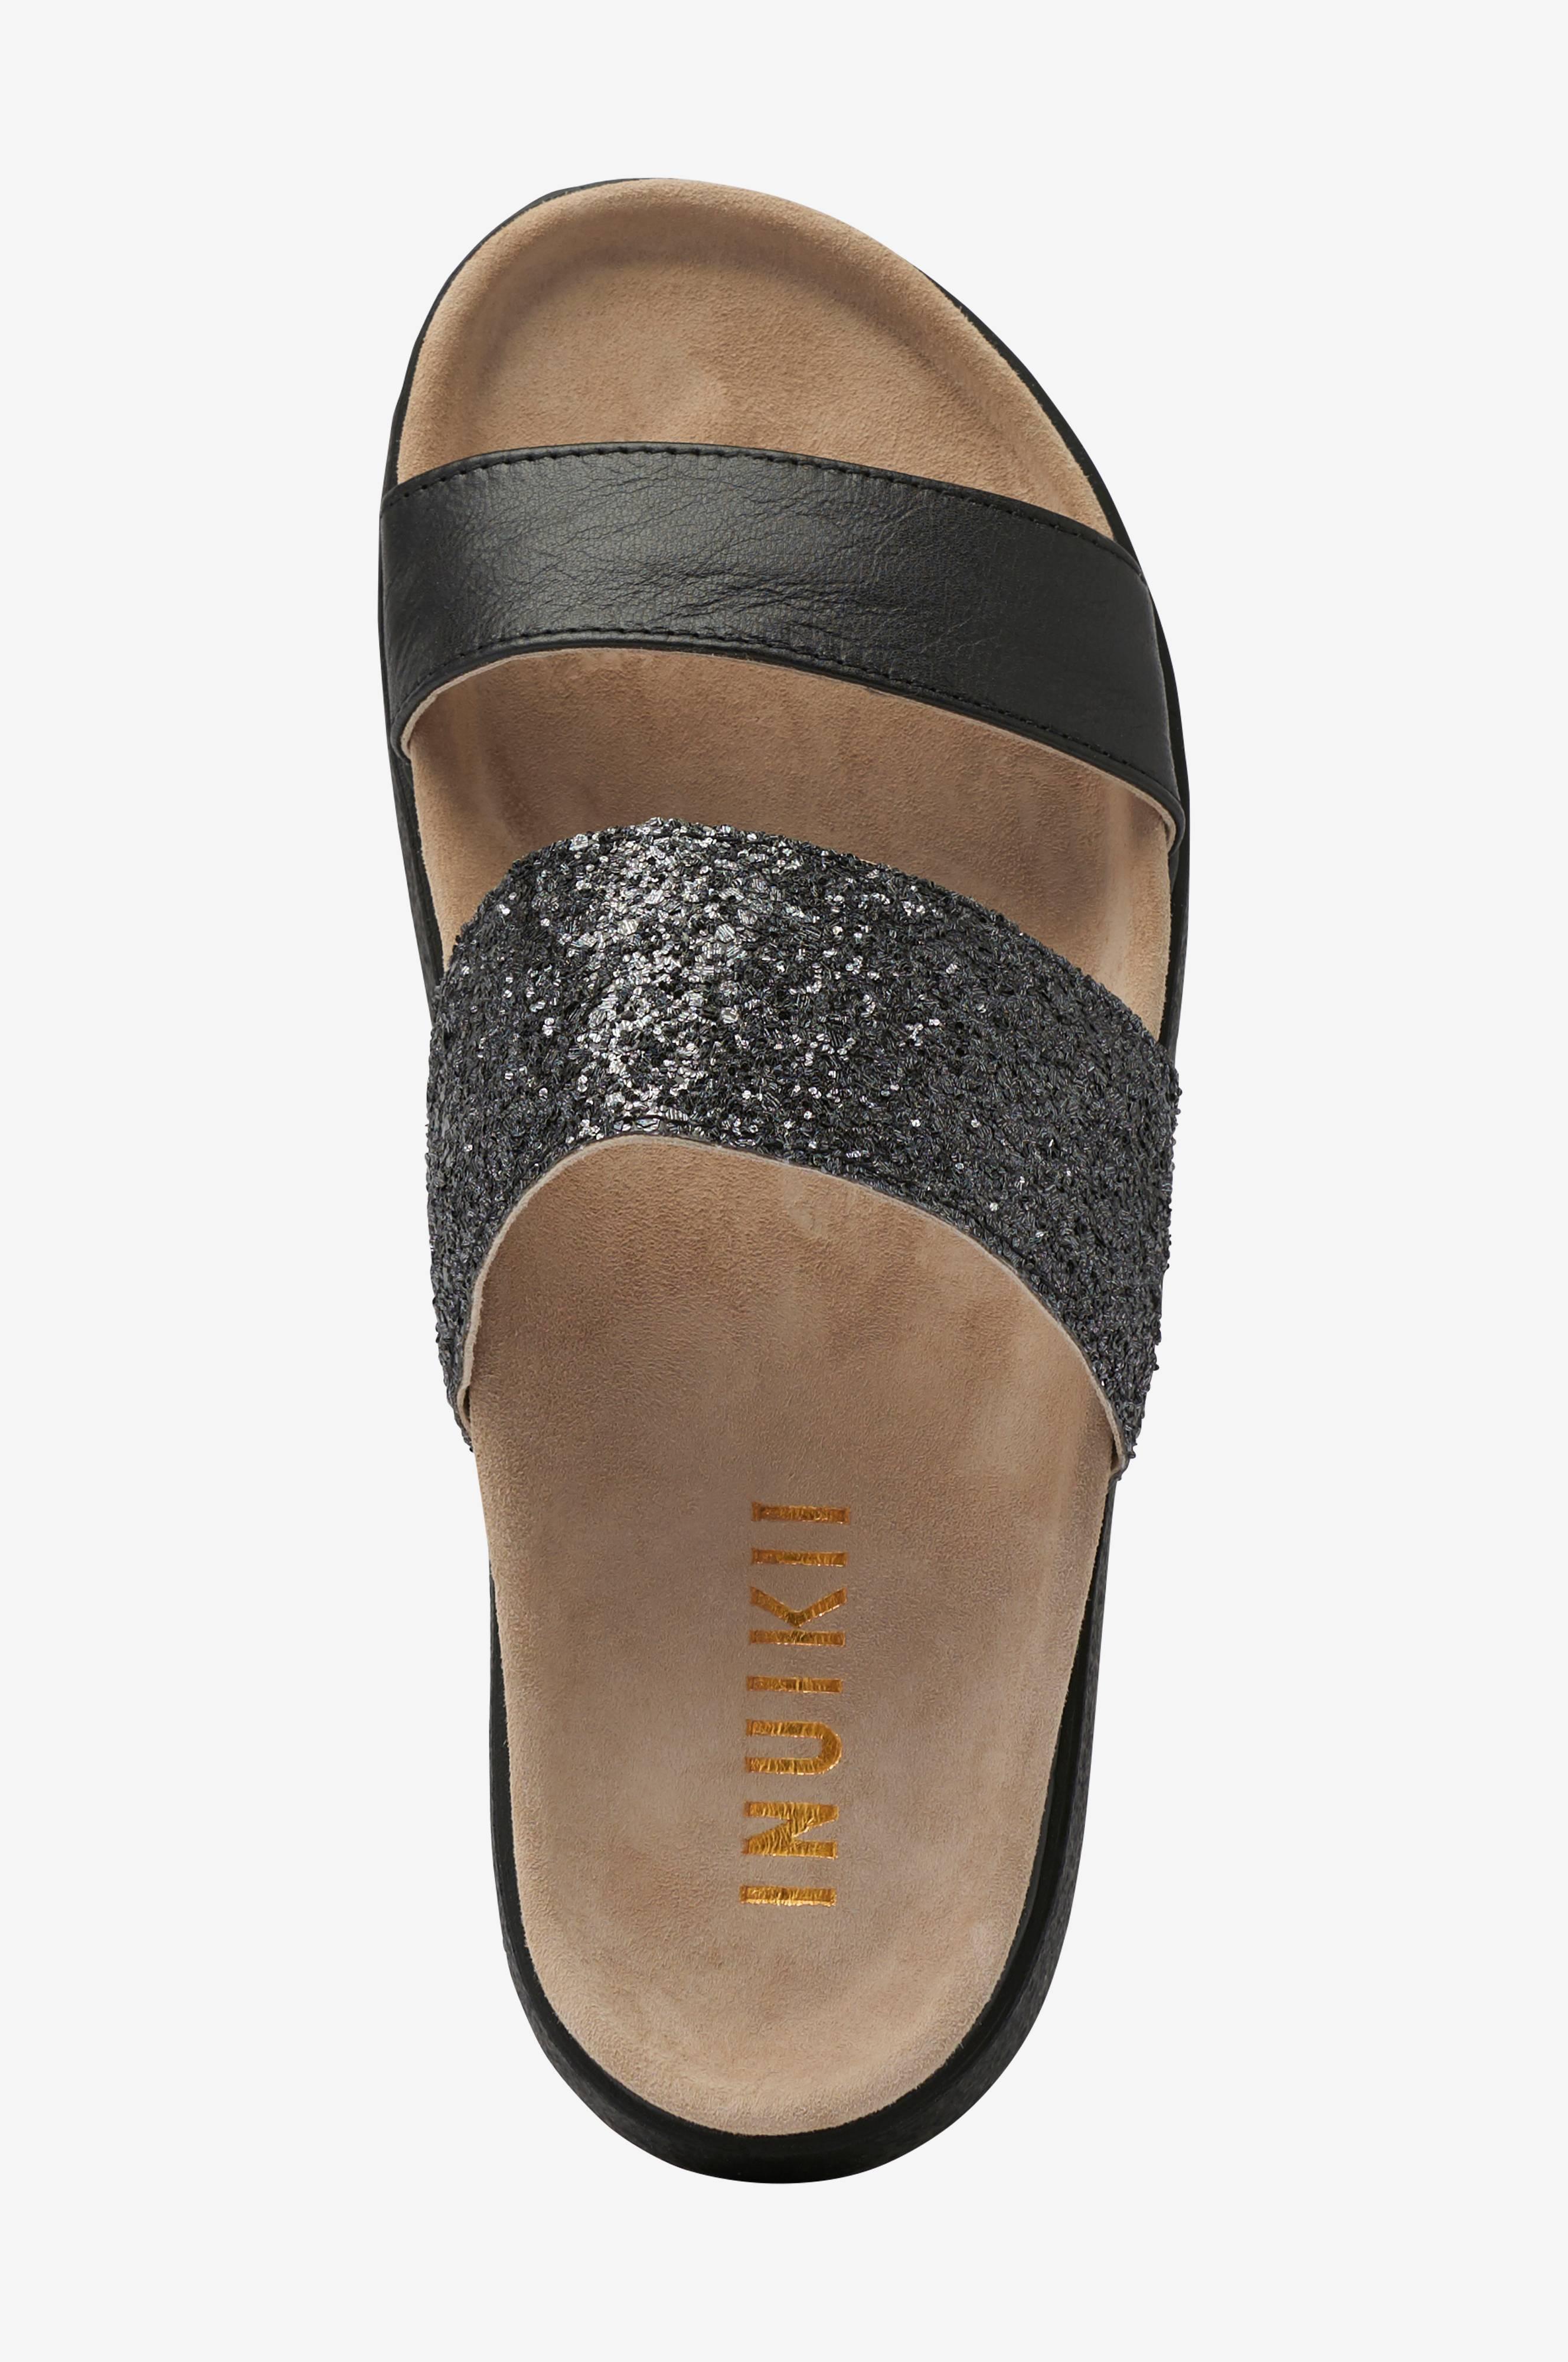 INUIKII Sandal Slipper Glitter Svart Dam Ellos.se